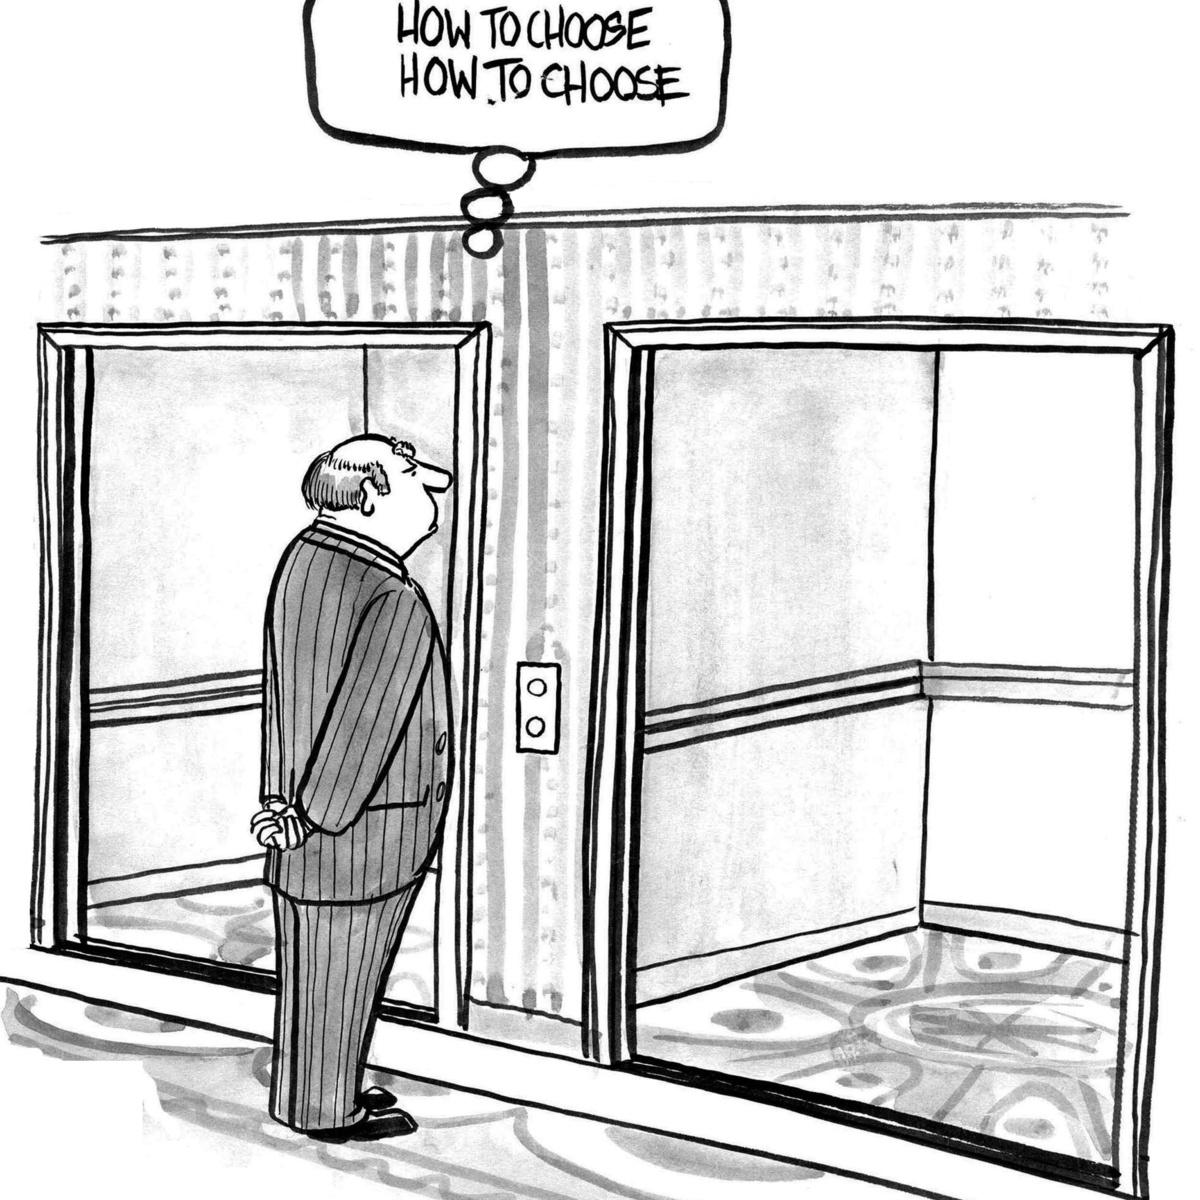 Heuristics in Performance Management